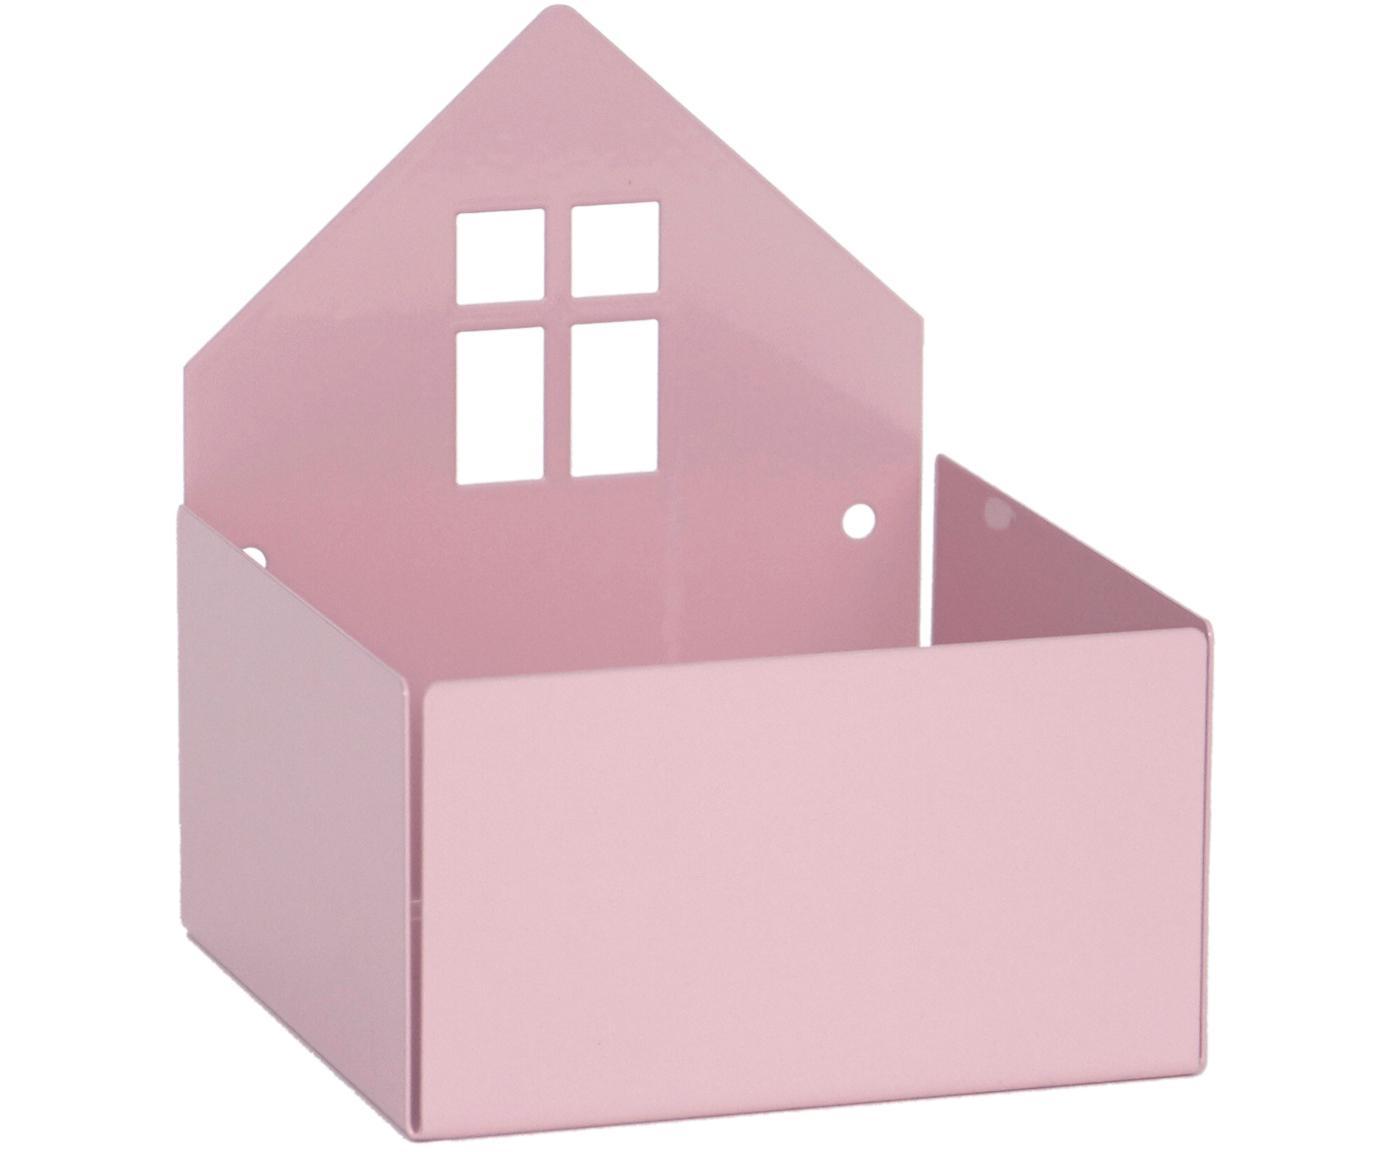 Caja Town House, Metal con pintura en polvo, Rosa, An 11 x Al 13 cm